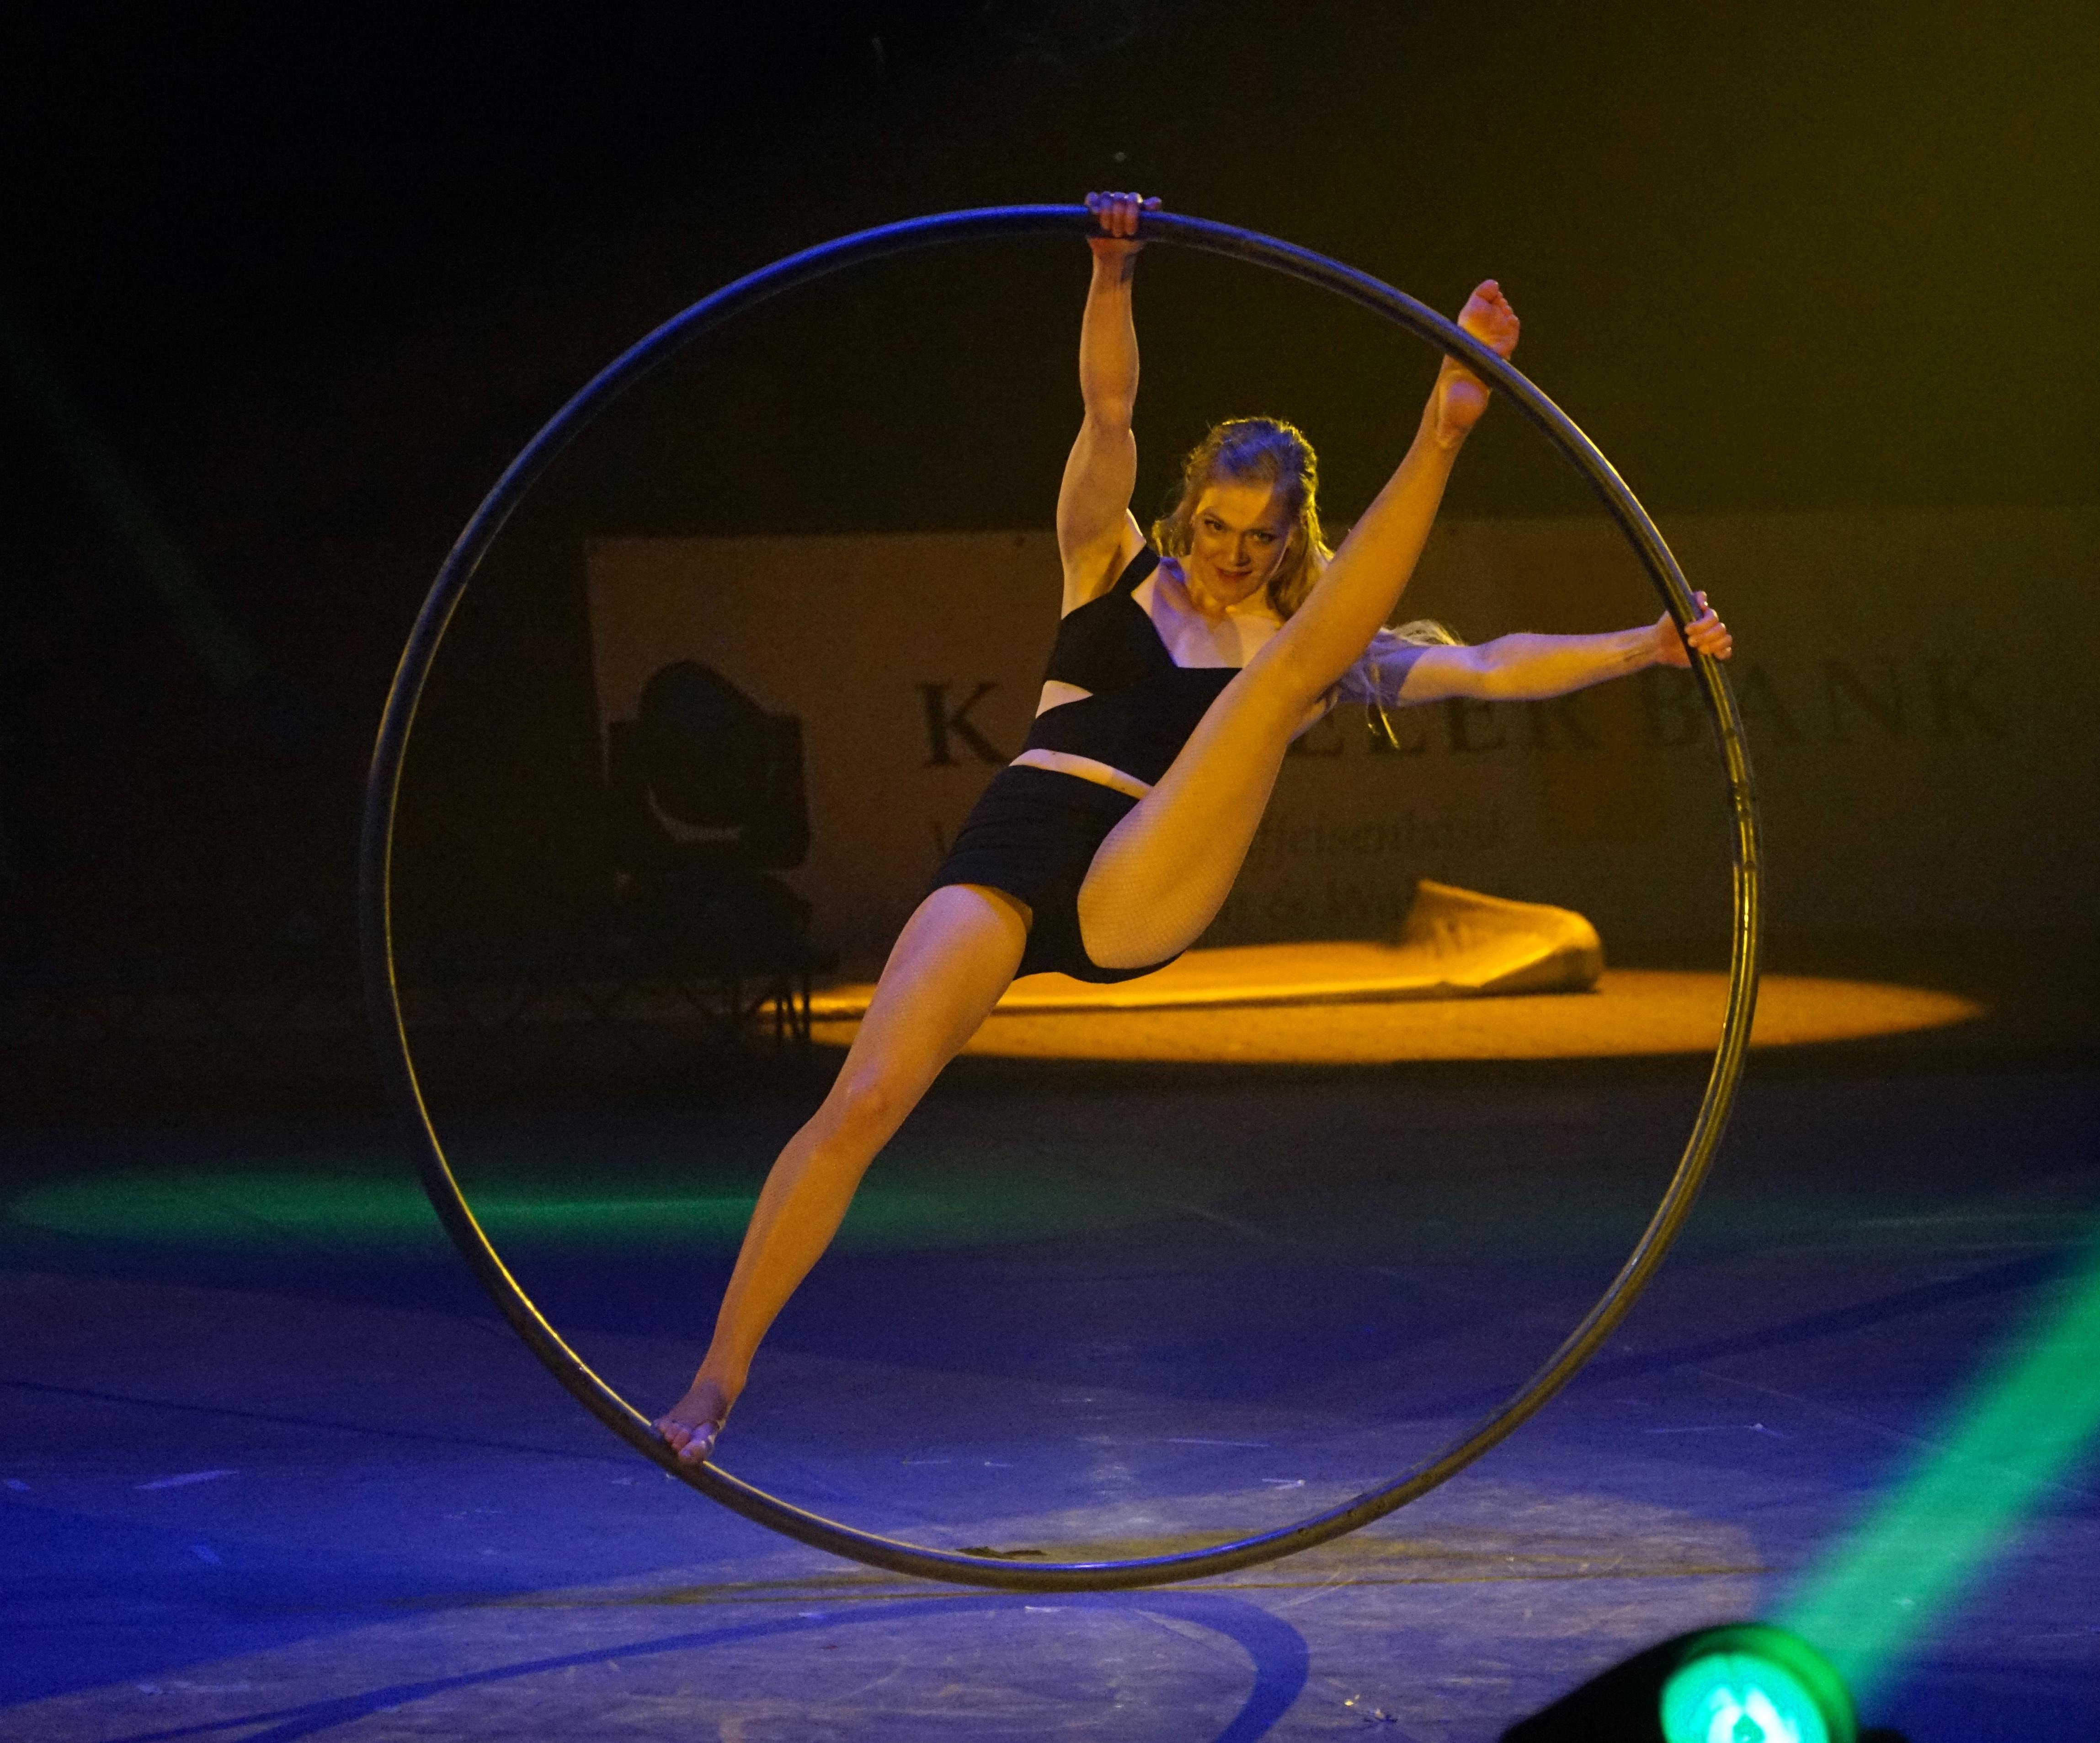 гимнастка на кольце картинки панорамой симферополя можно